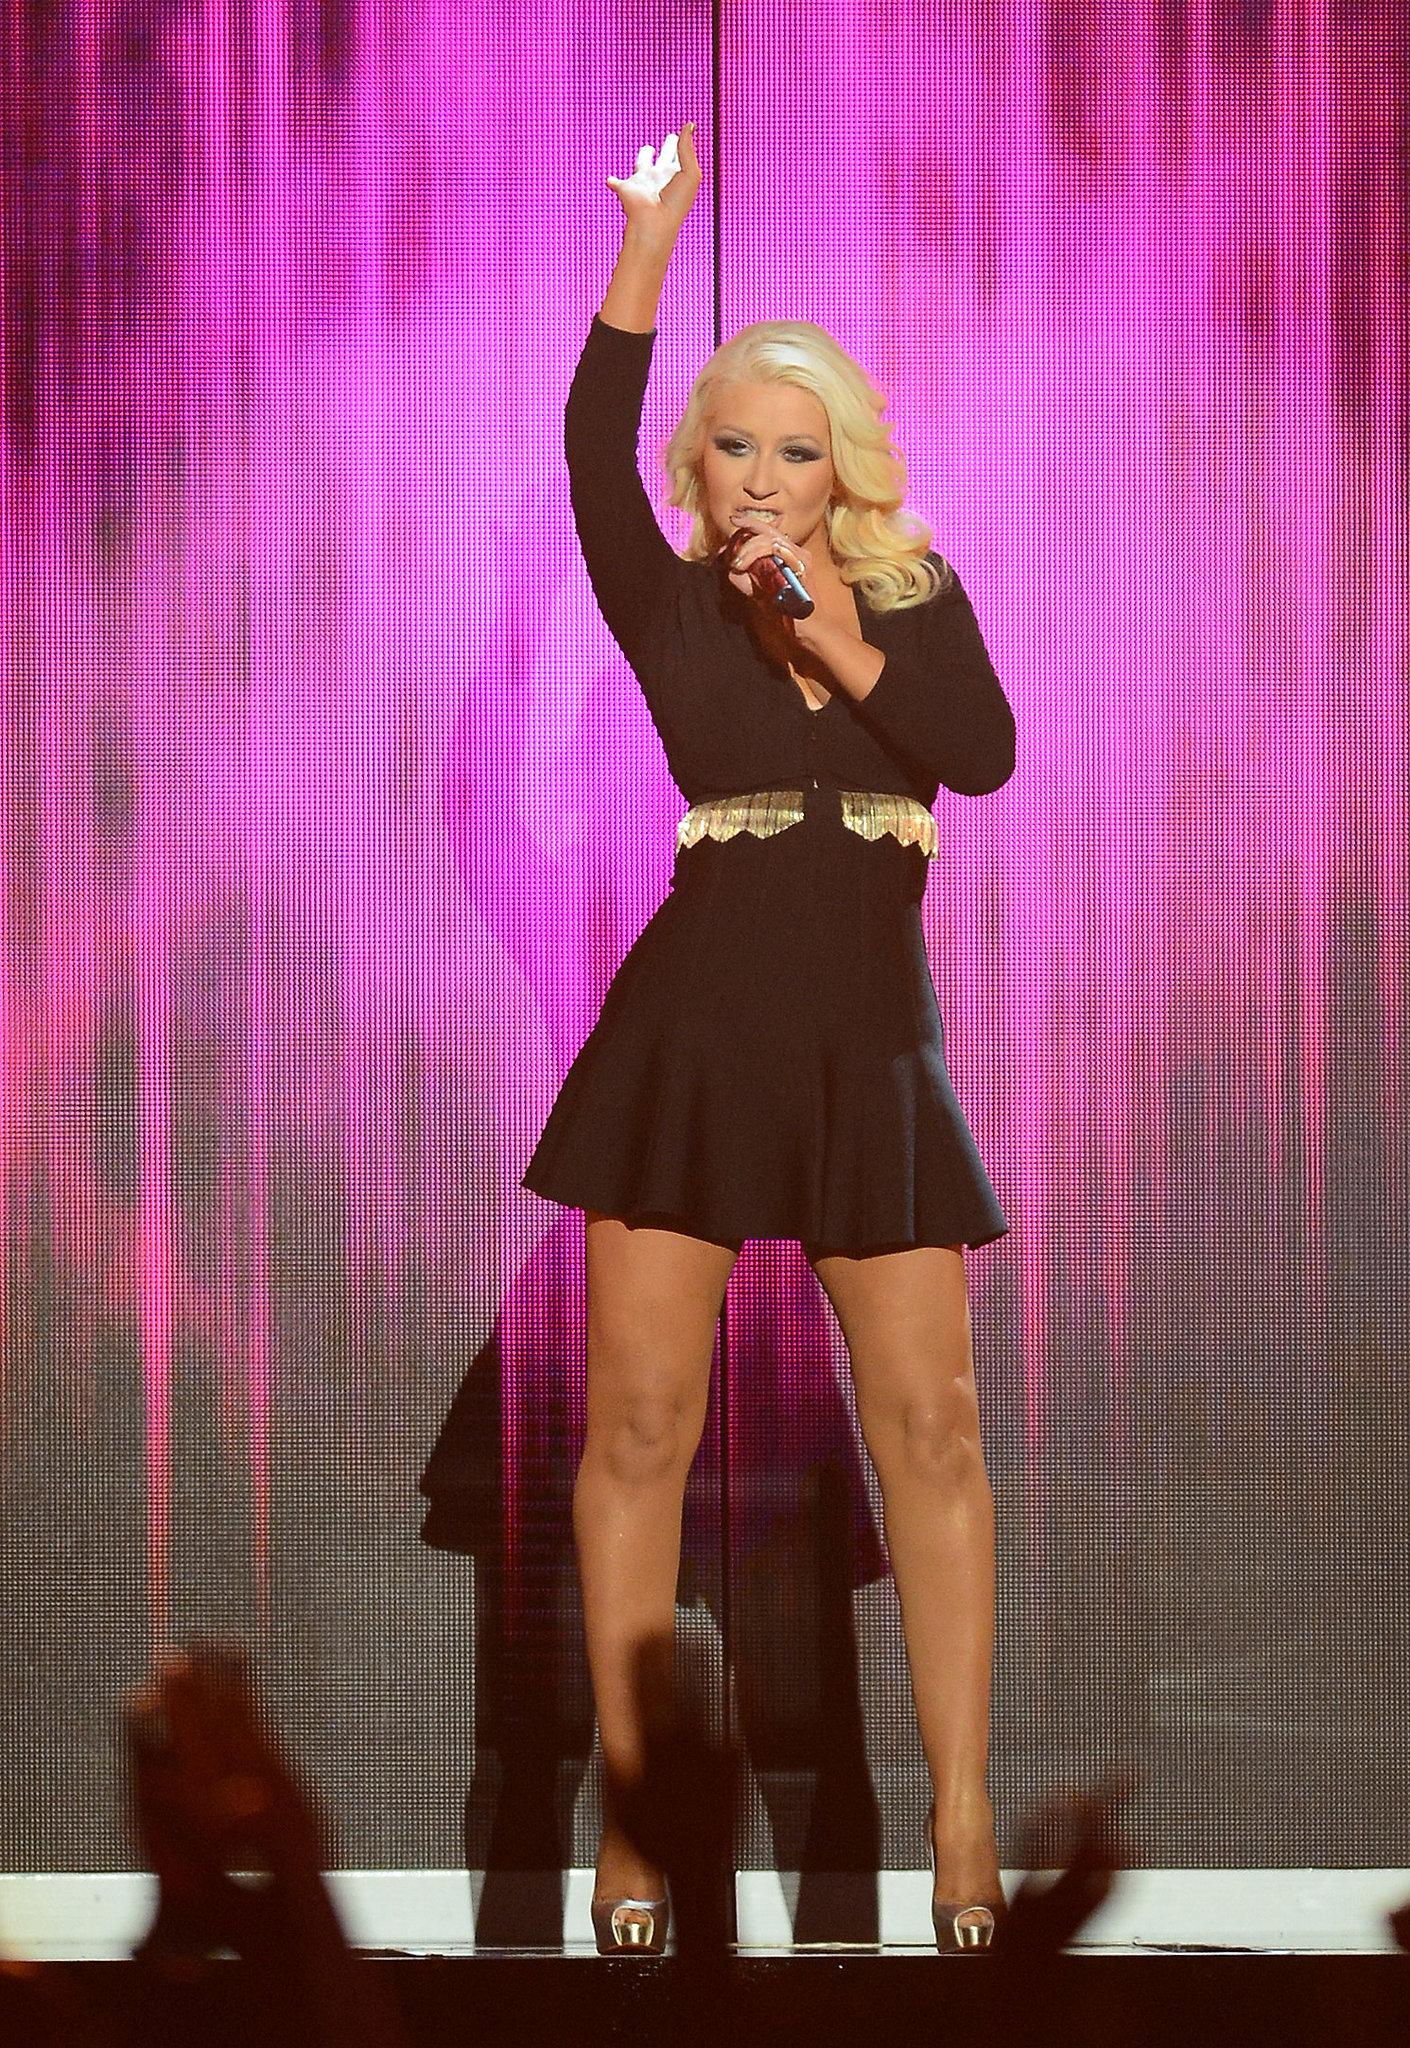 Christina Aguilera performed with Pitbull at the Billboard Music Awards.